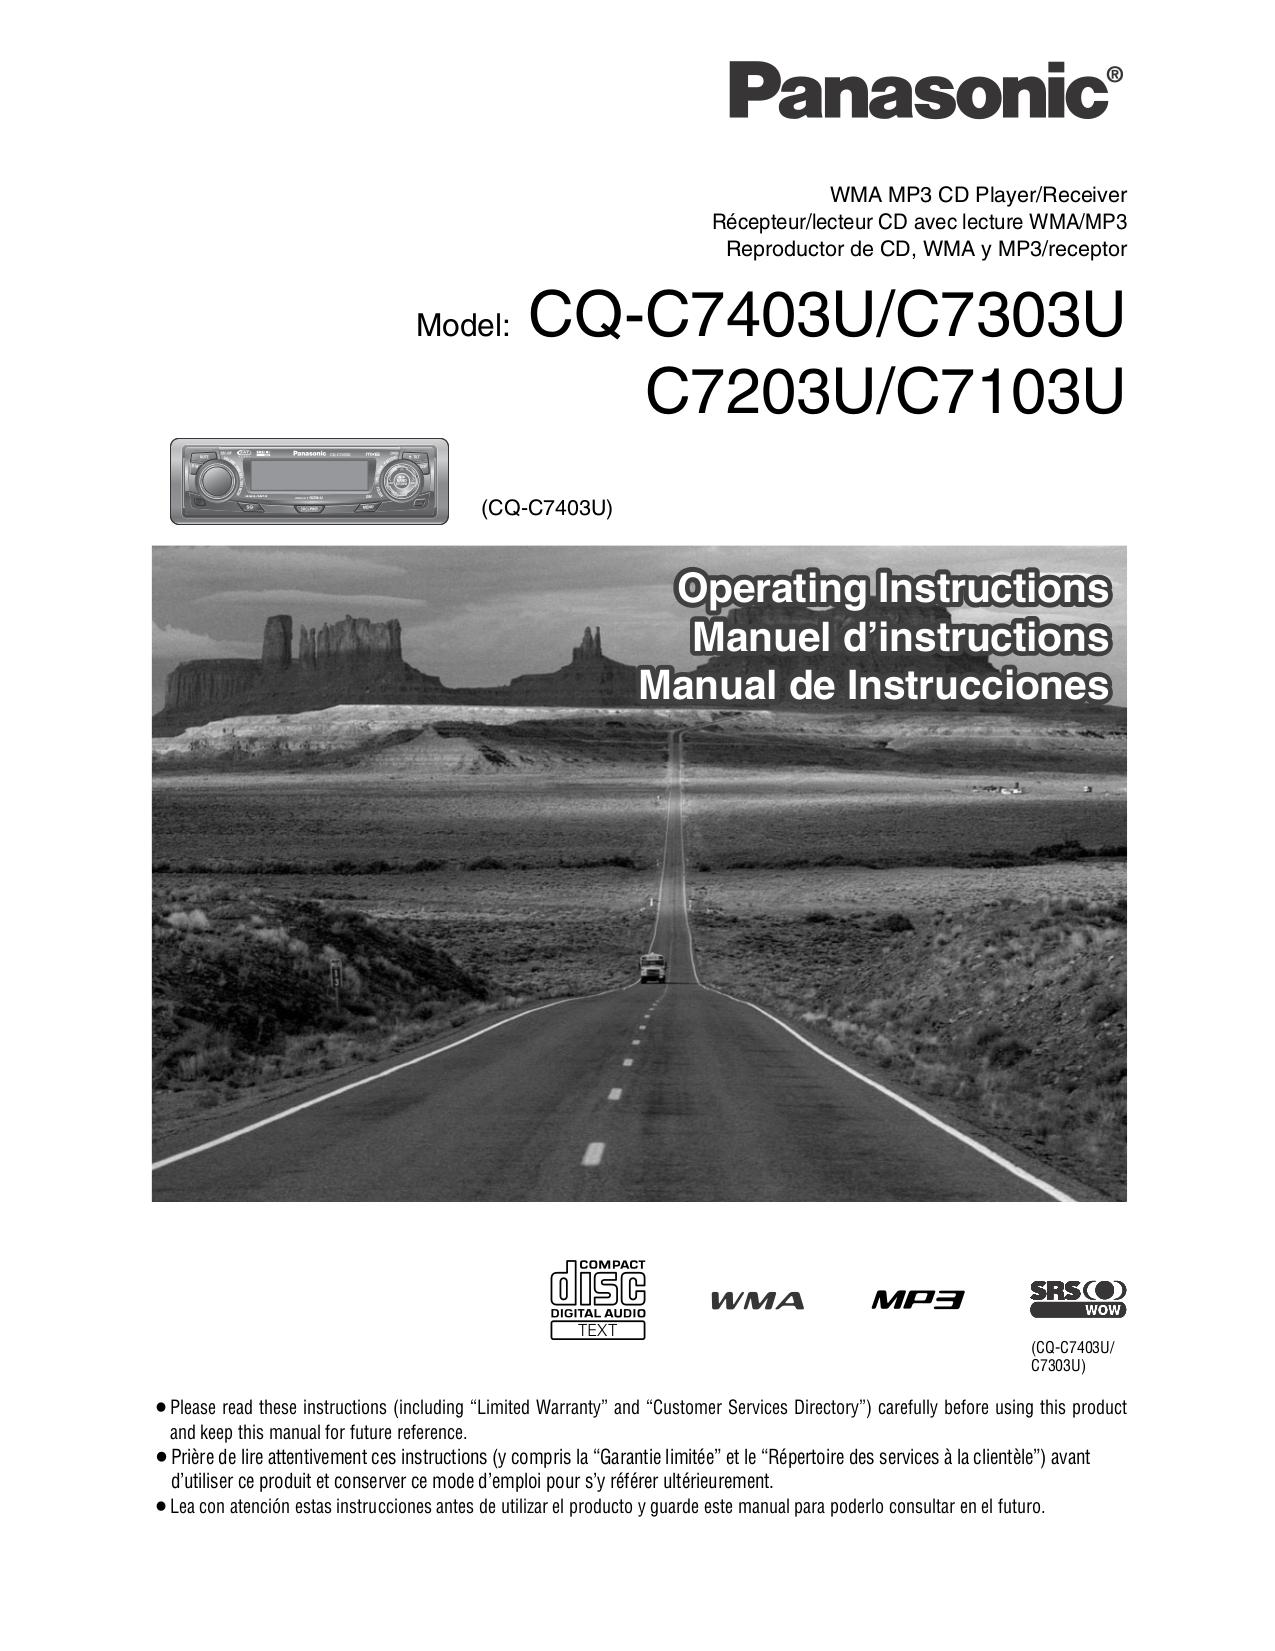 Panasonic Cq C7103u Wiring Diagram Automotive C7105u Download Free Pdf For Car Receiver Manual Rh Umlib Com Cd Installation